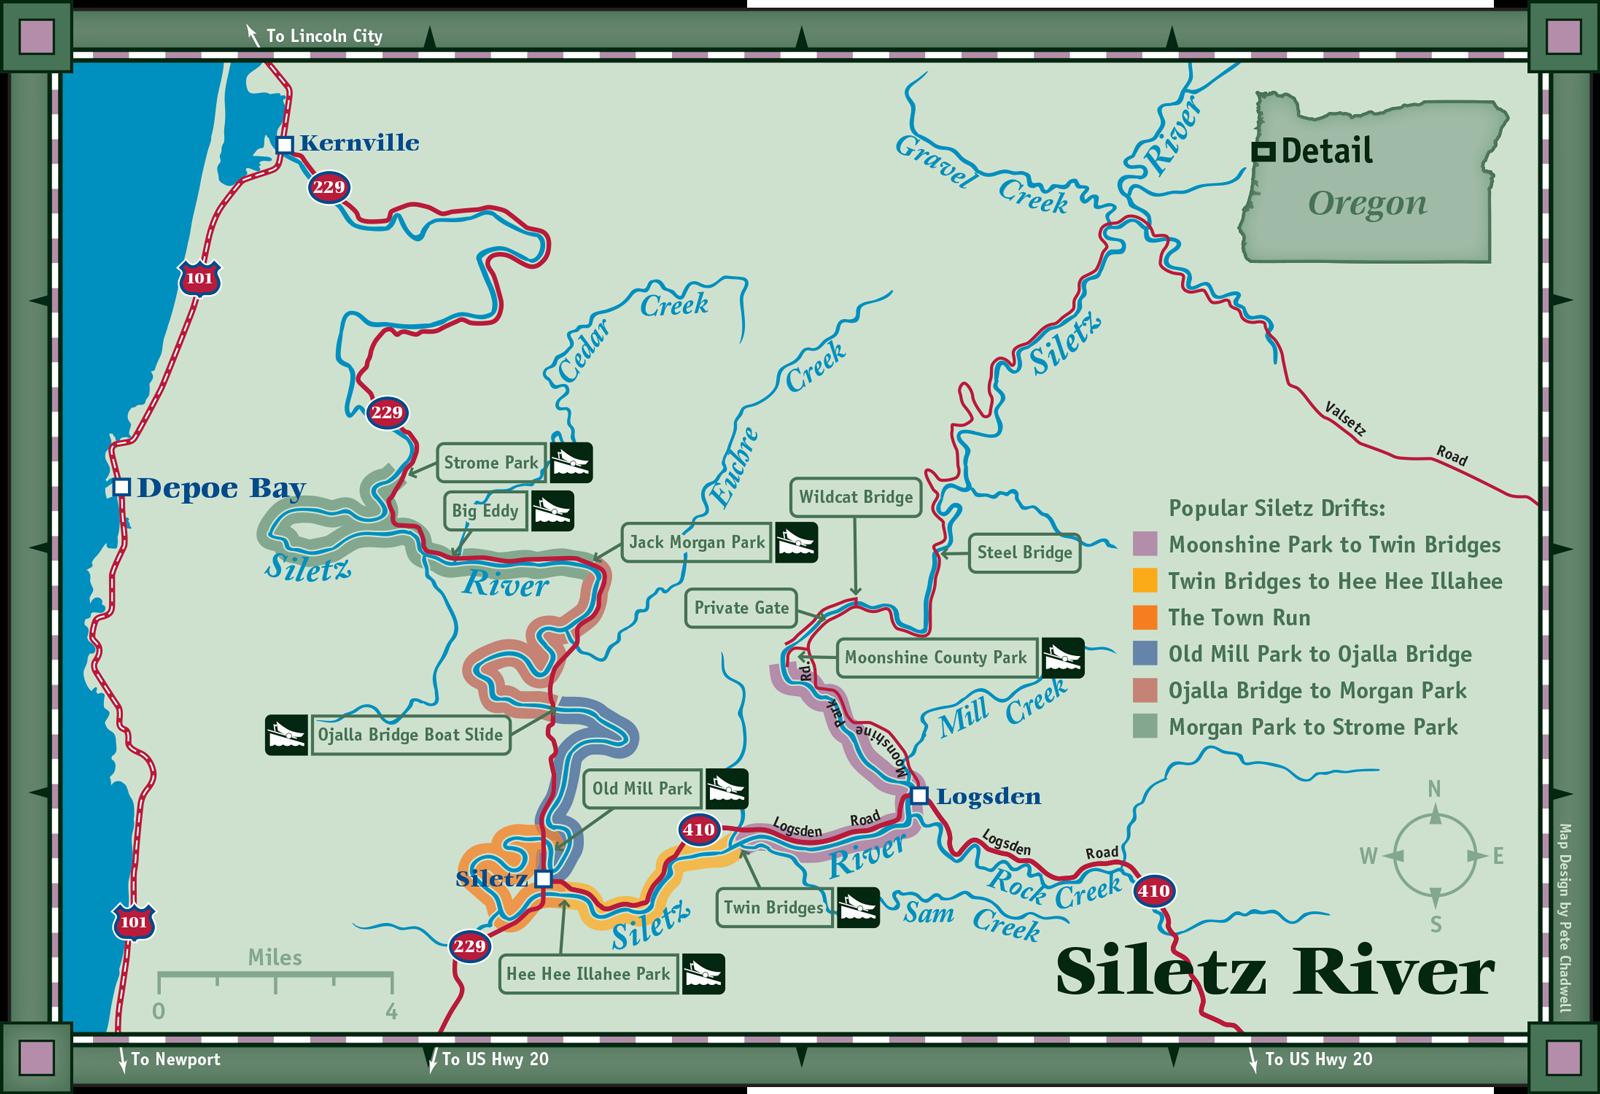 SiletzRiver_Final.png